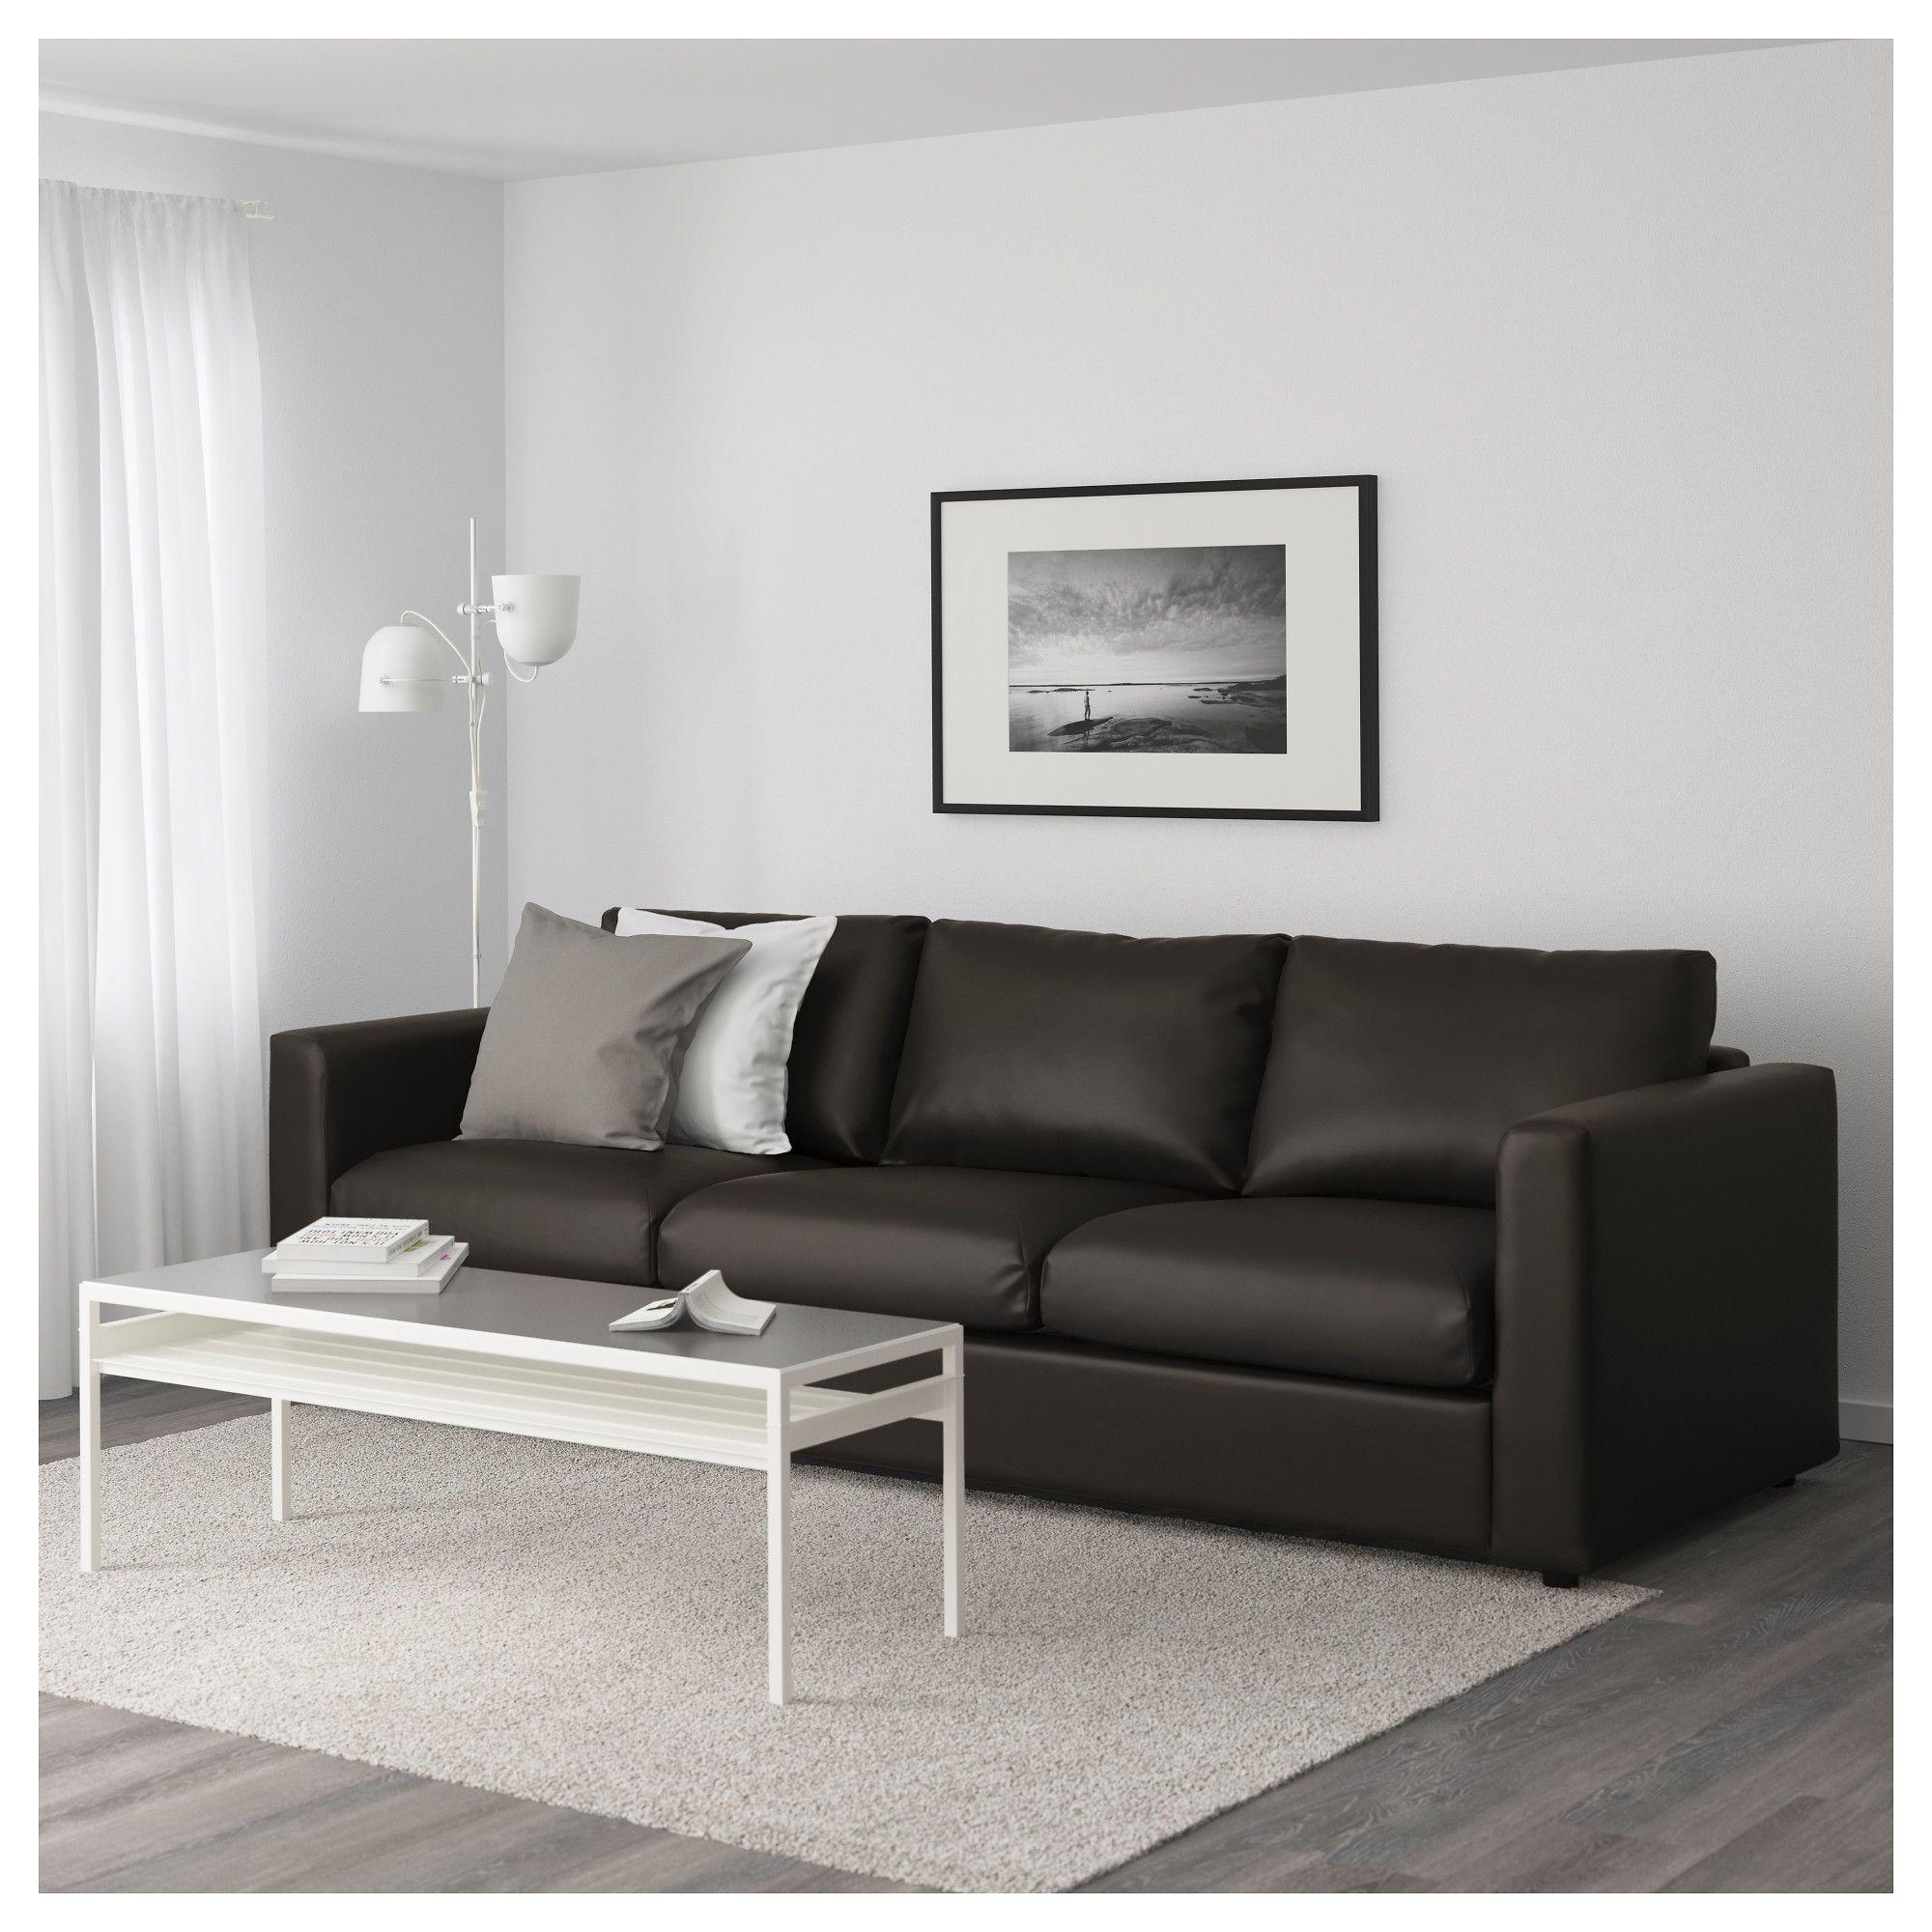 Furniture And Home Furnishings Friheten Sofa Bed Sofa Sofa Bed